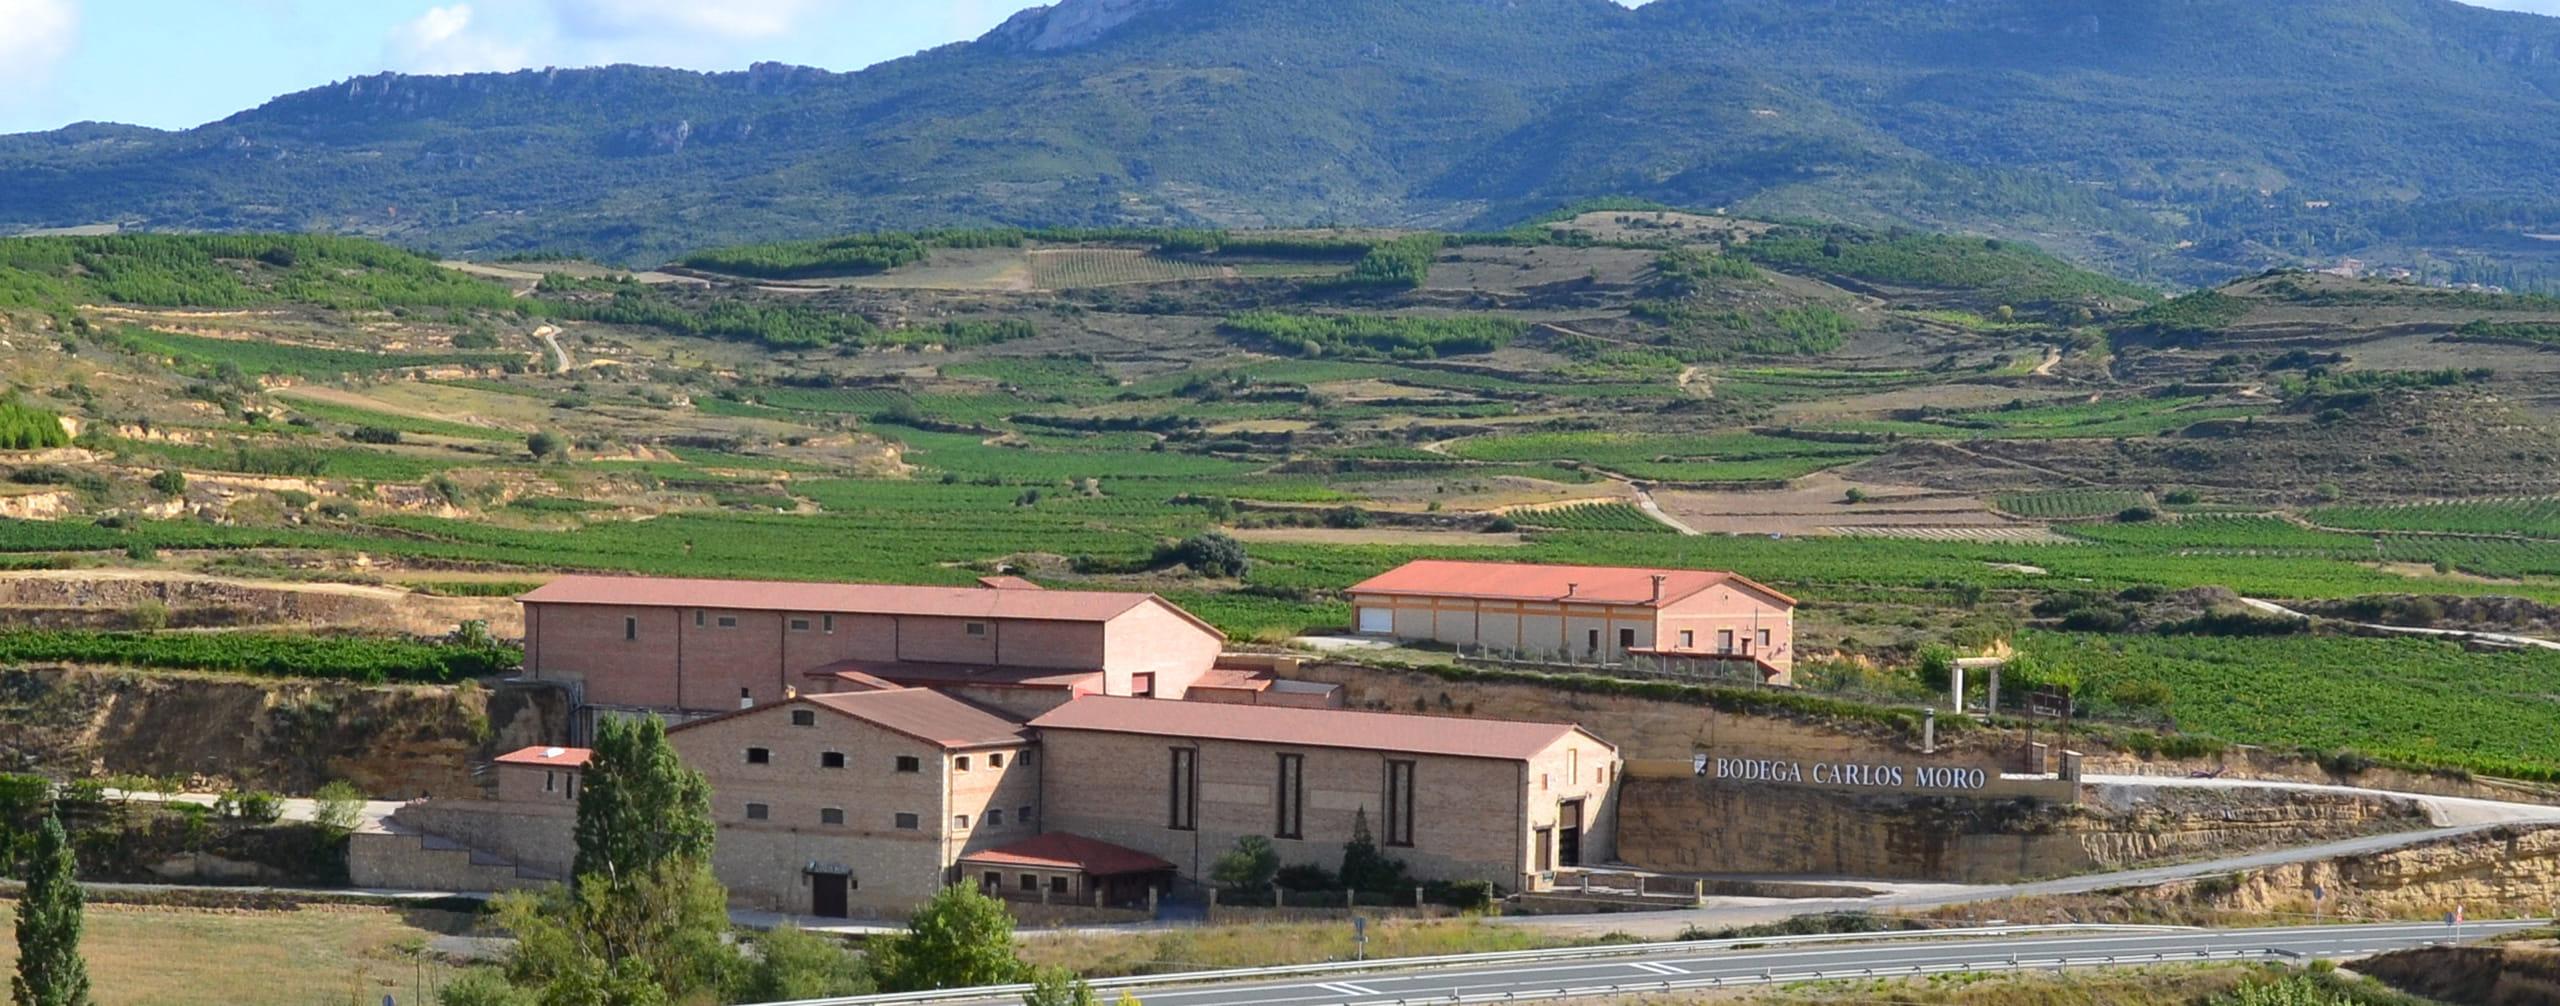 Carlos Moro wineries